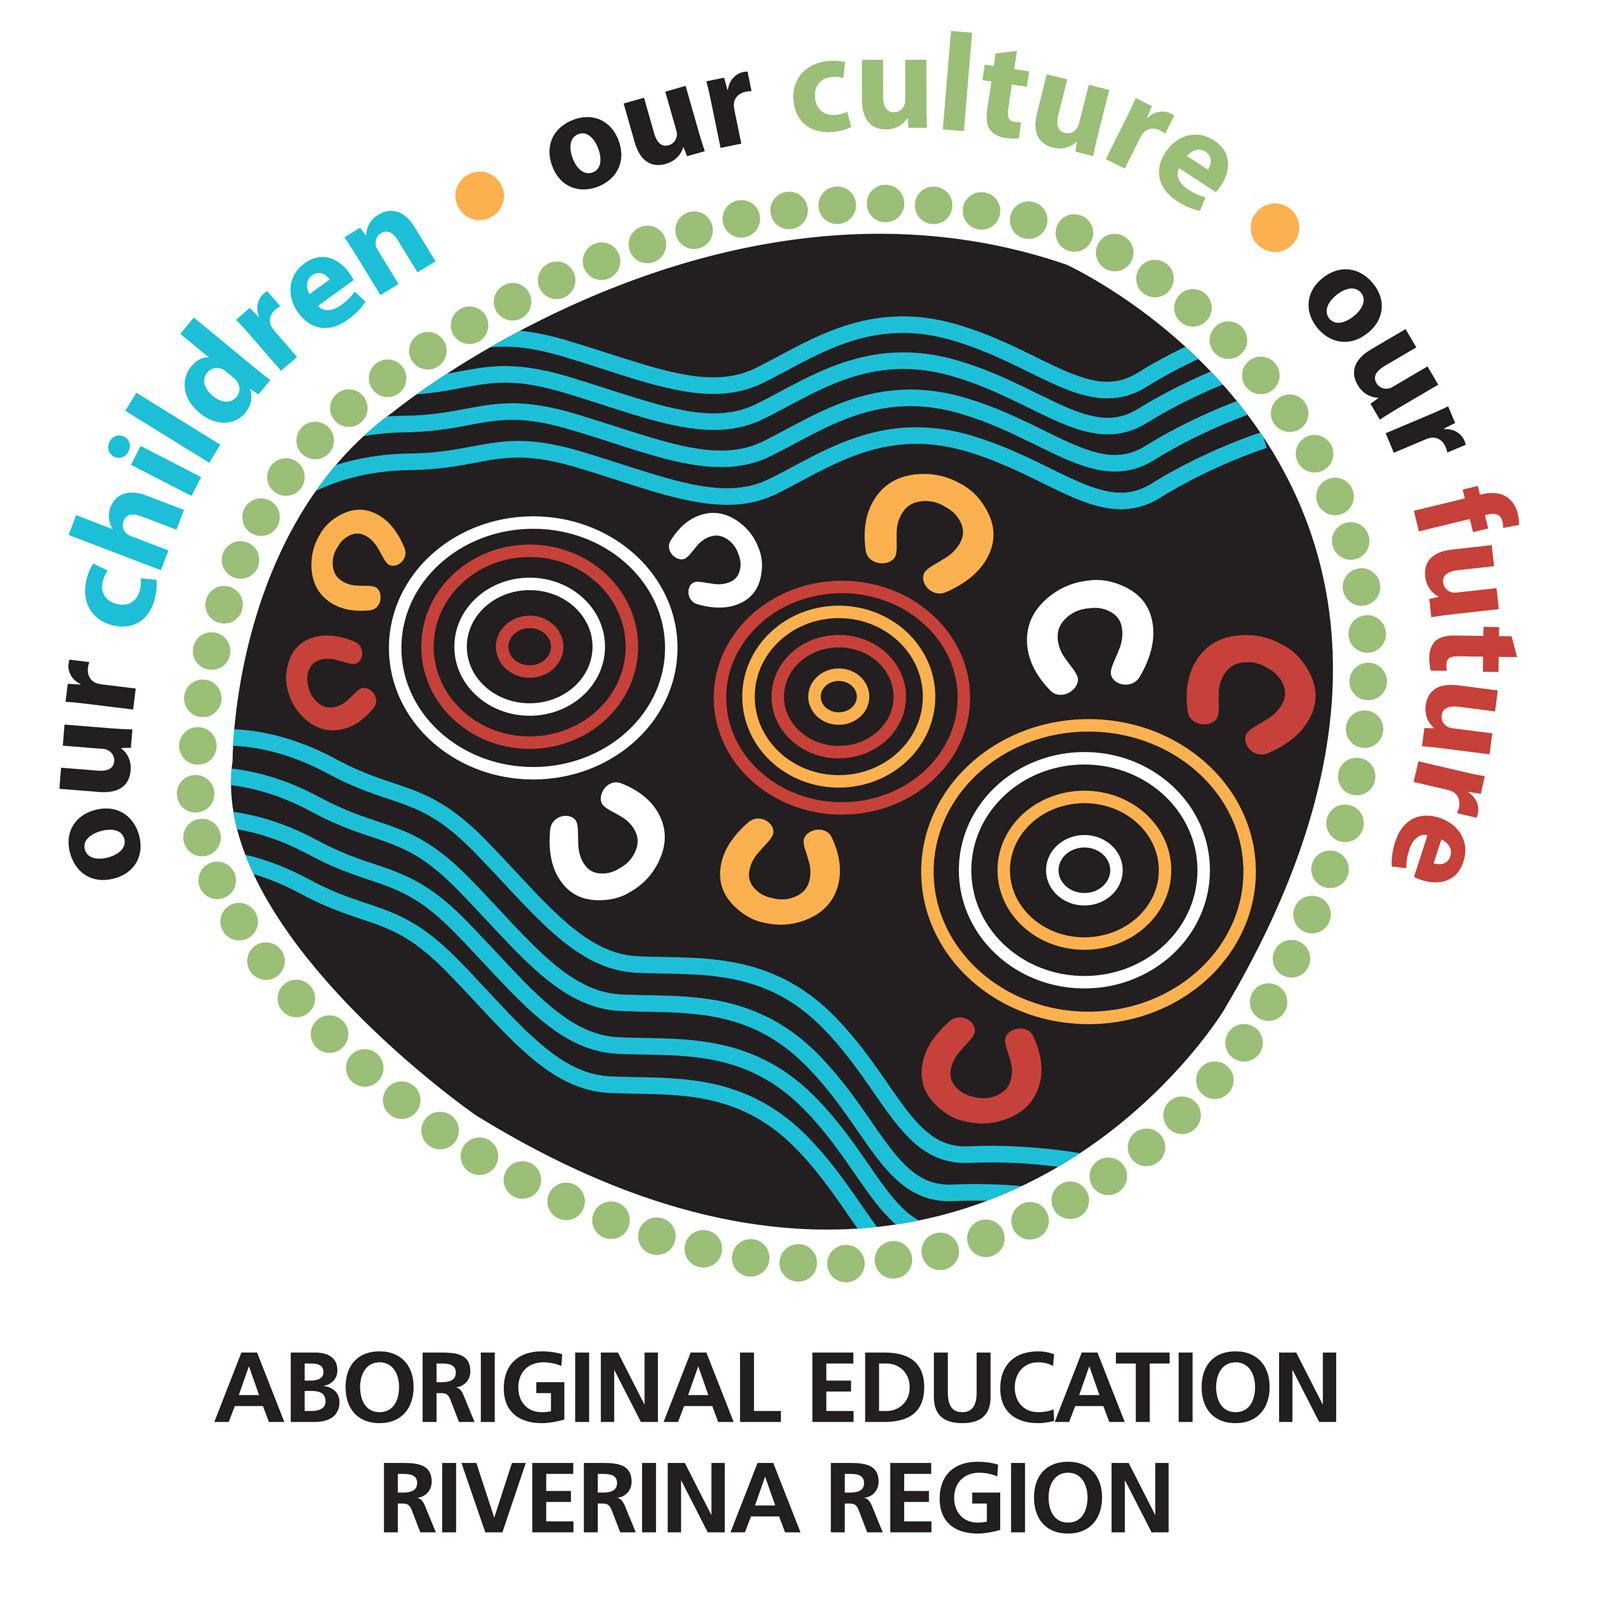 Aboriginal Education Riverina Region